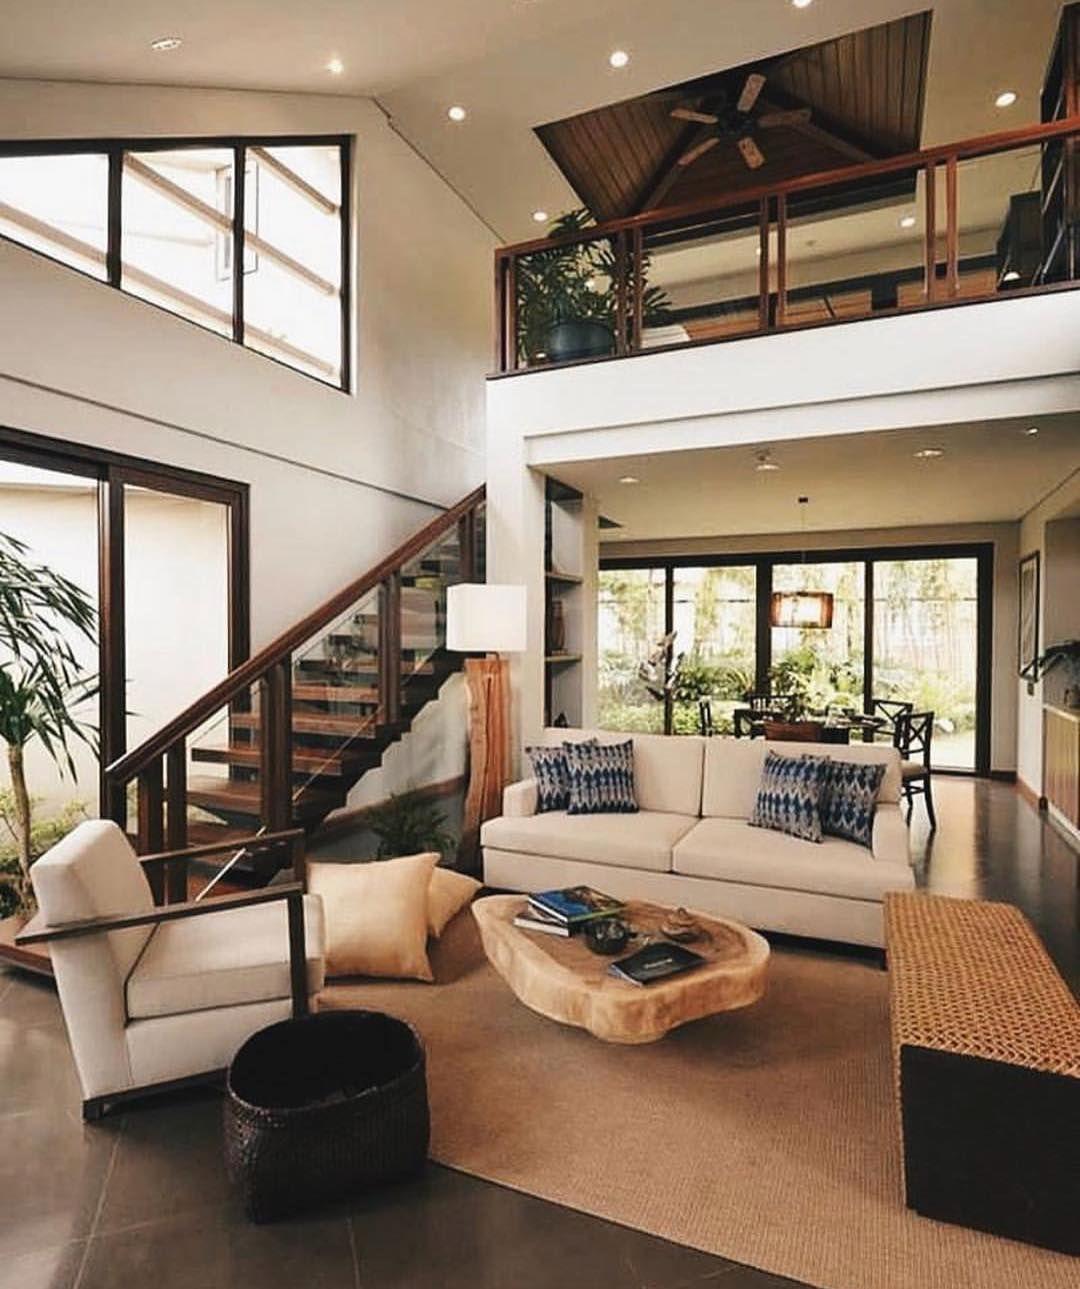 Tropical Beach House Interior: Cozy Interior By Manosa Architects